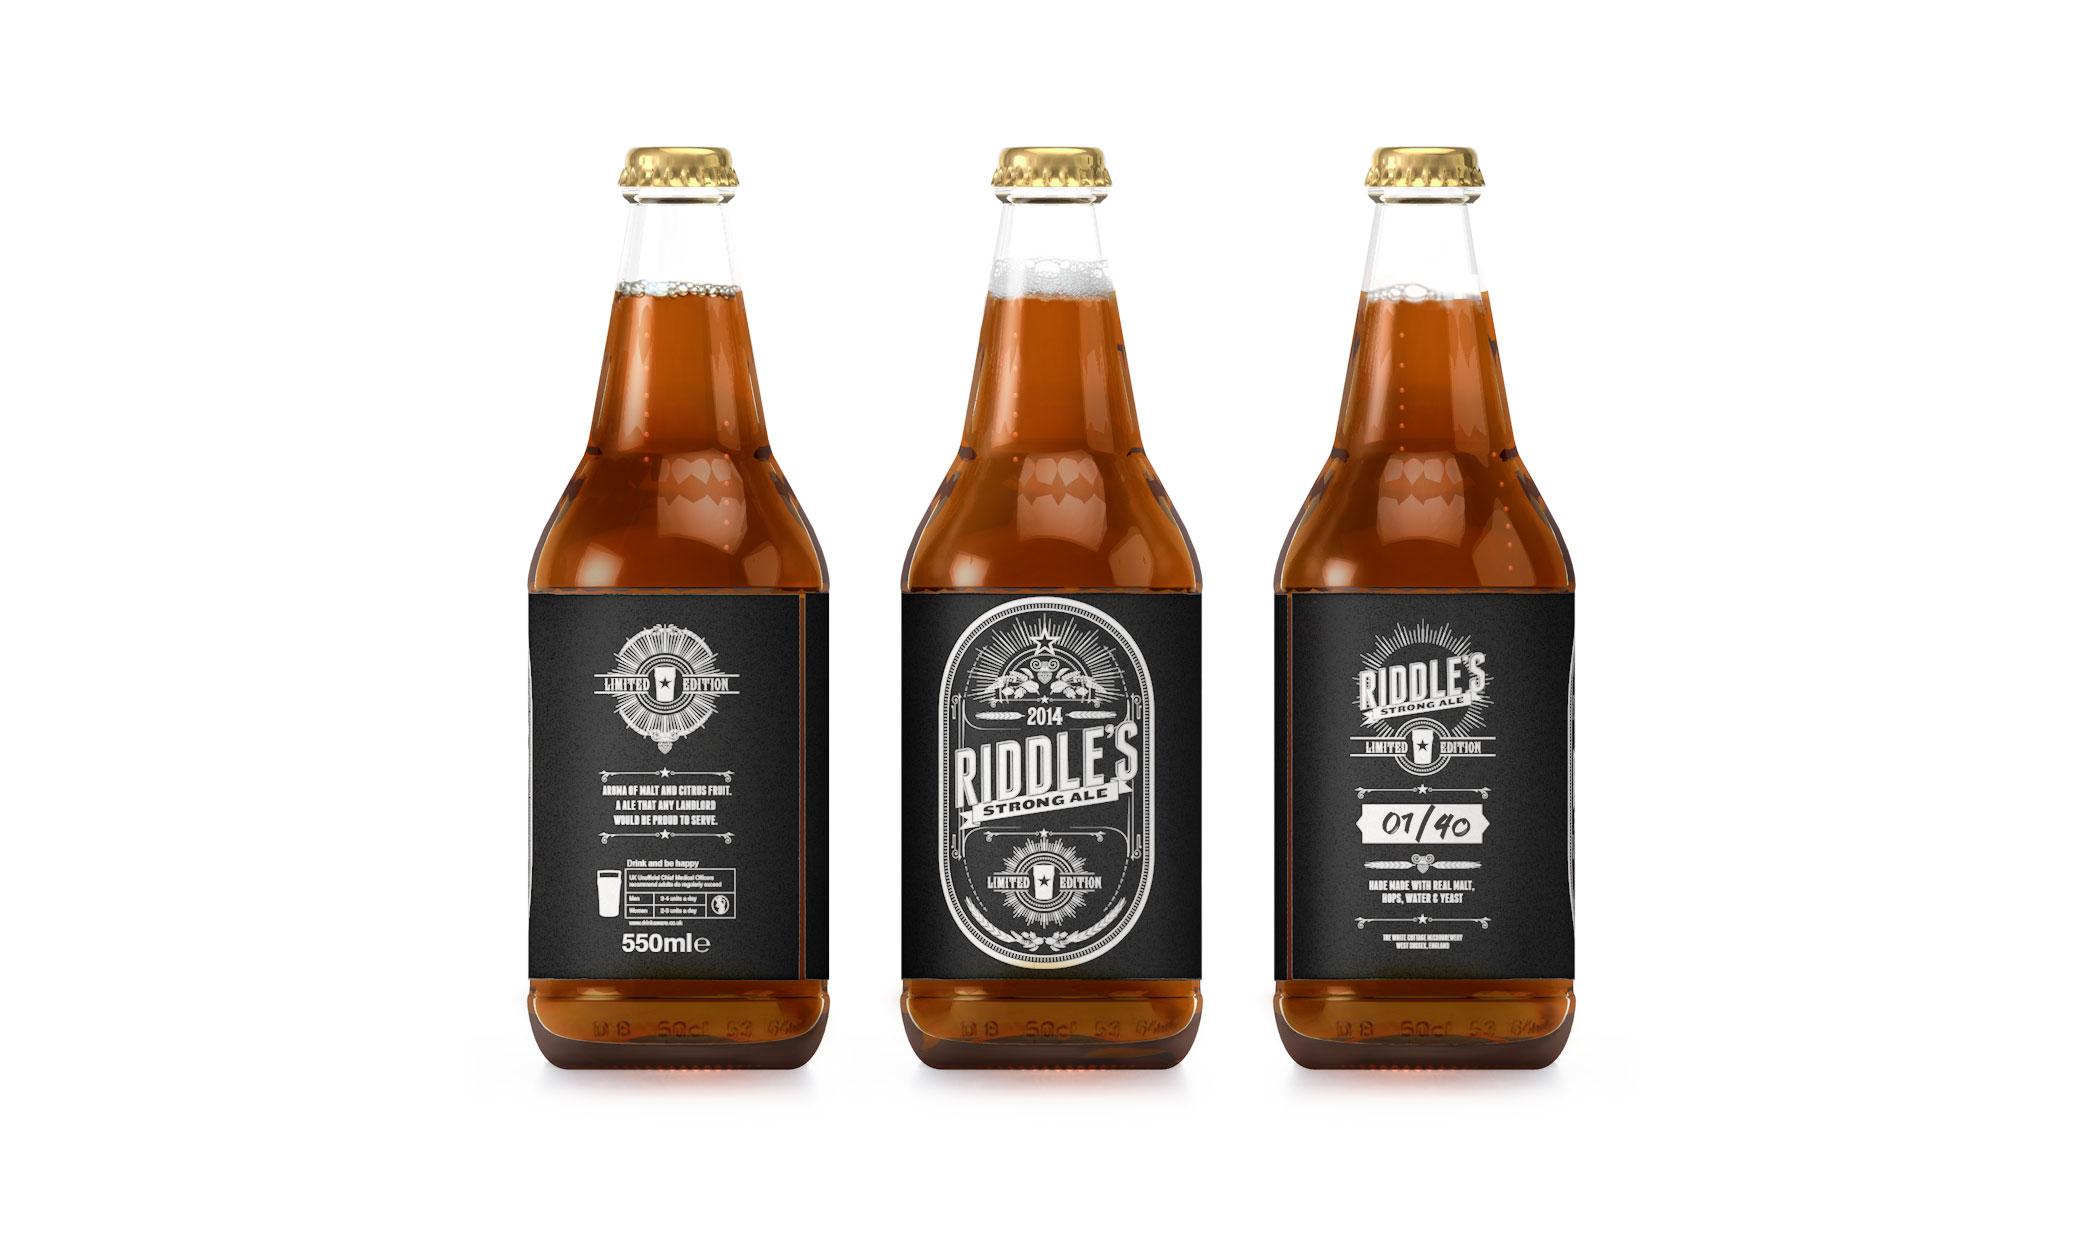 Riddle's Ale